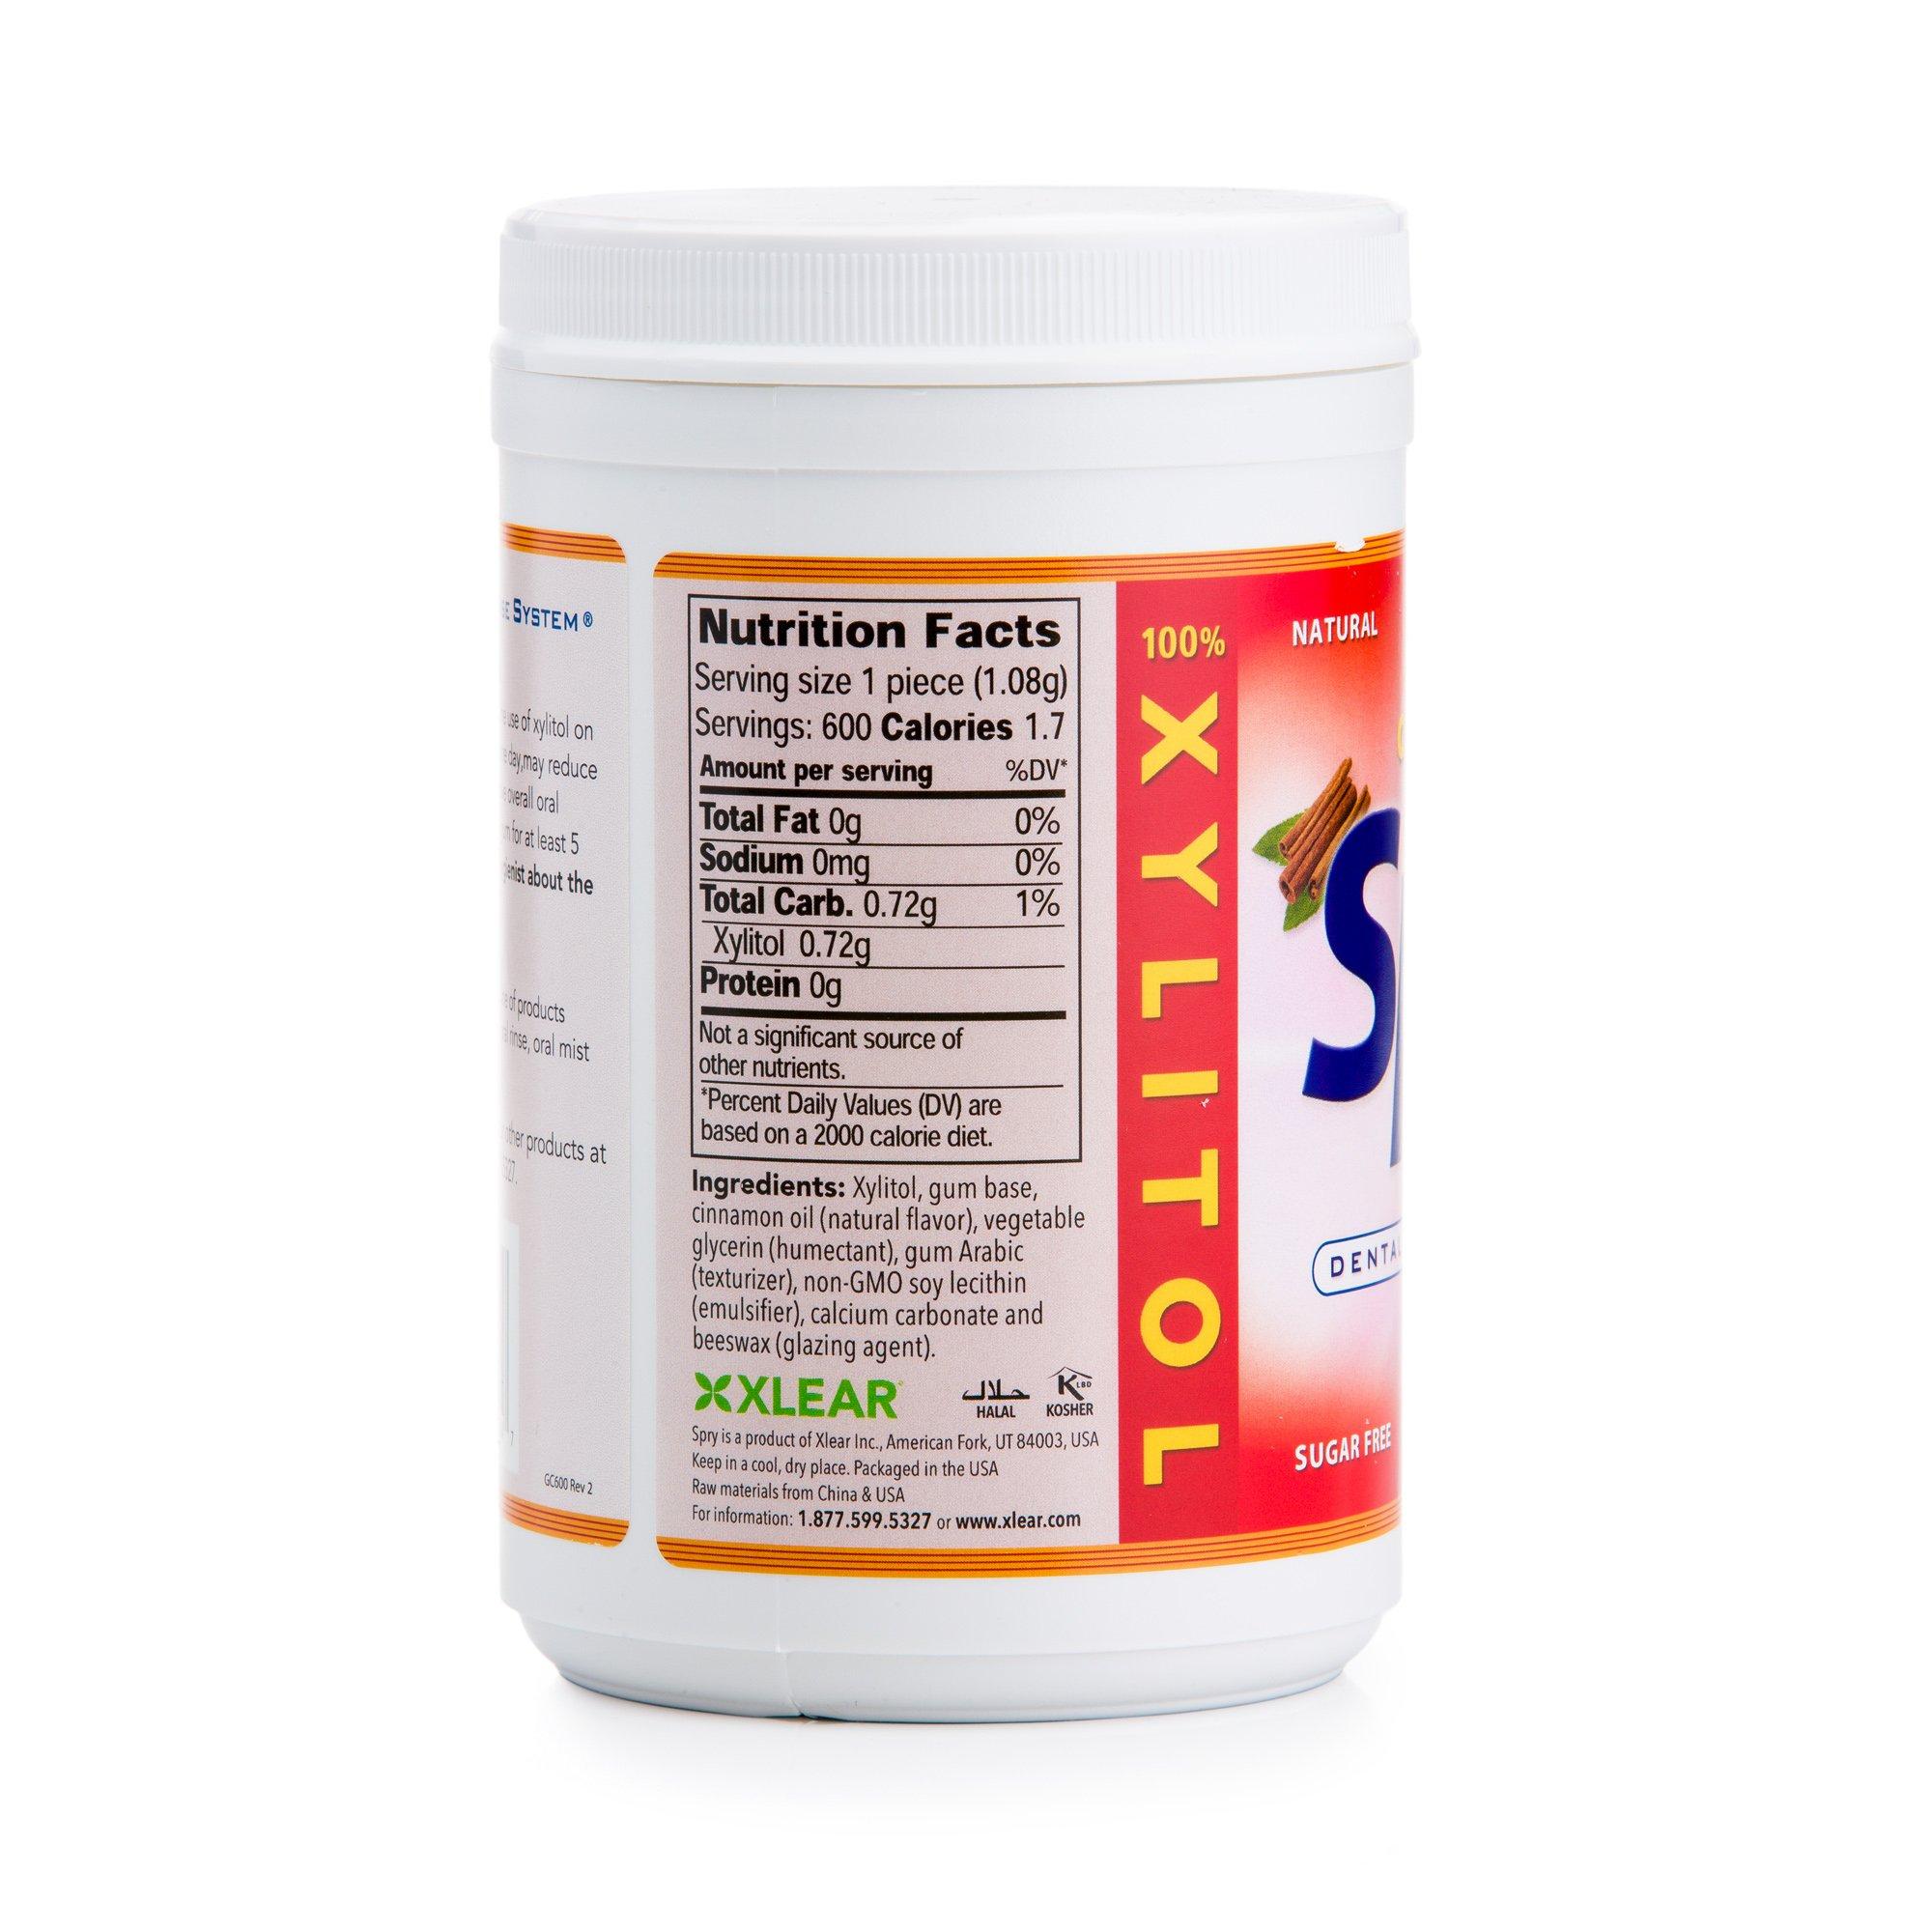 Xlear Spry 600ct Xylitol Gum 3-PACK SAVINGS!!! (Cinnamon, Fresh Fruit, Spearmint) by Xlear (Image #4)